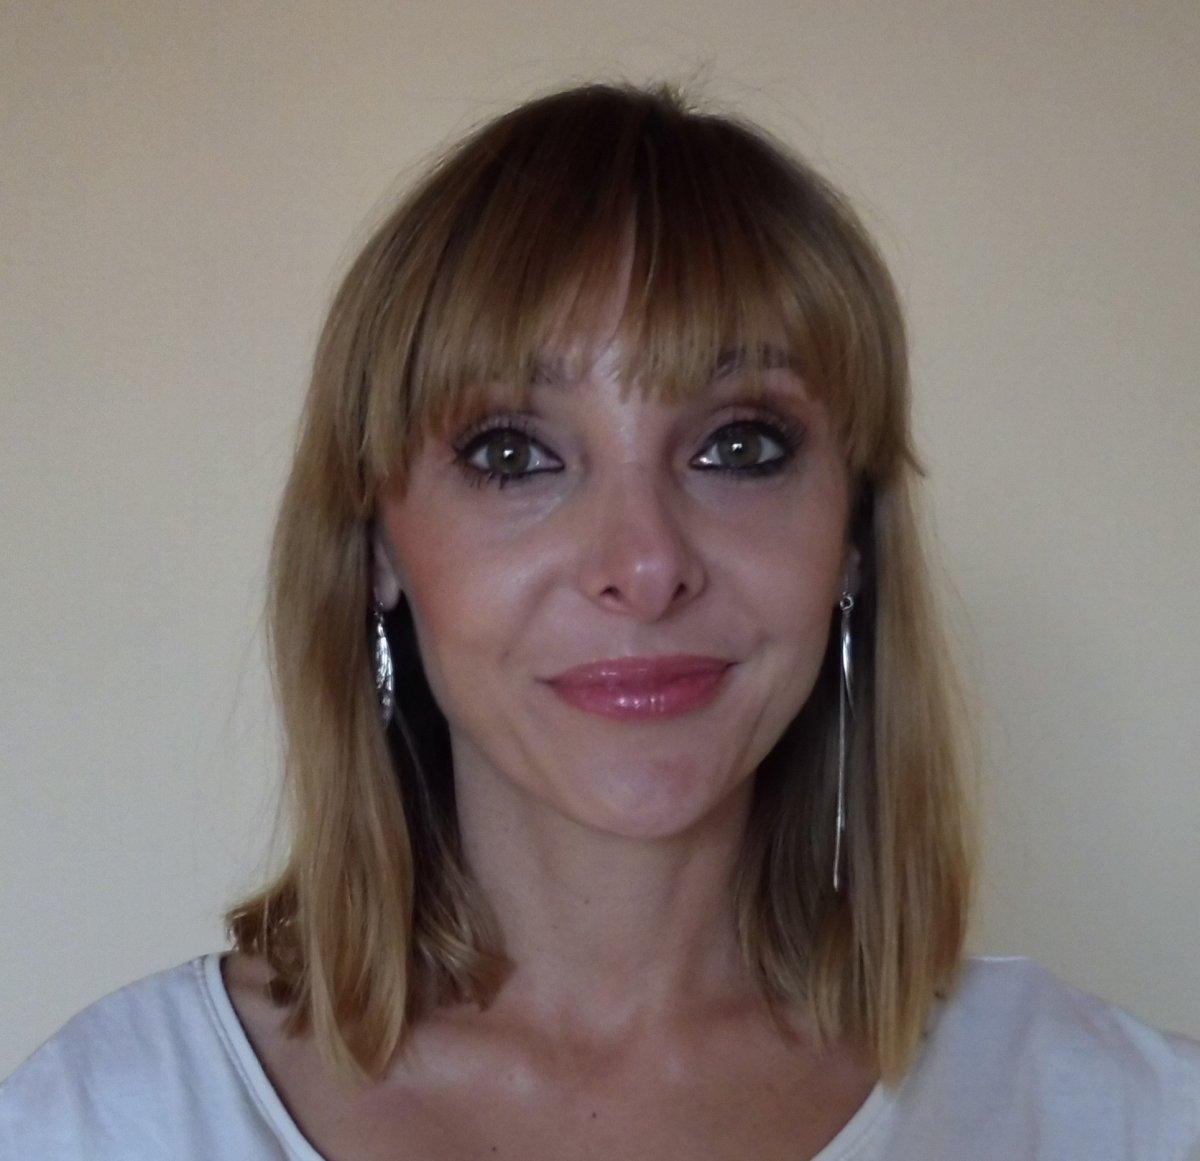 Anna lysyanskaya phd thesis